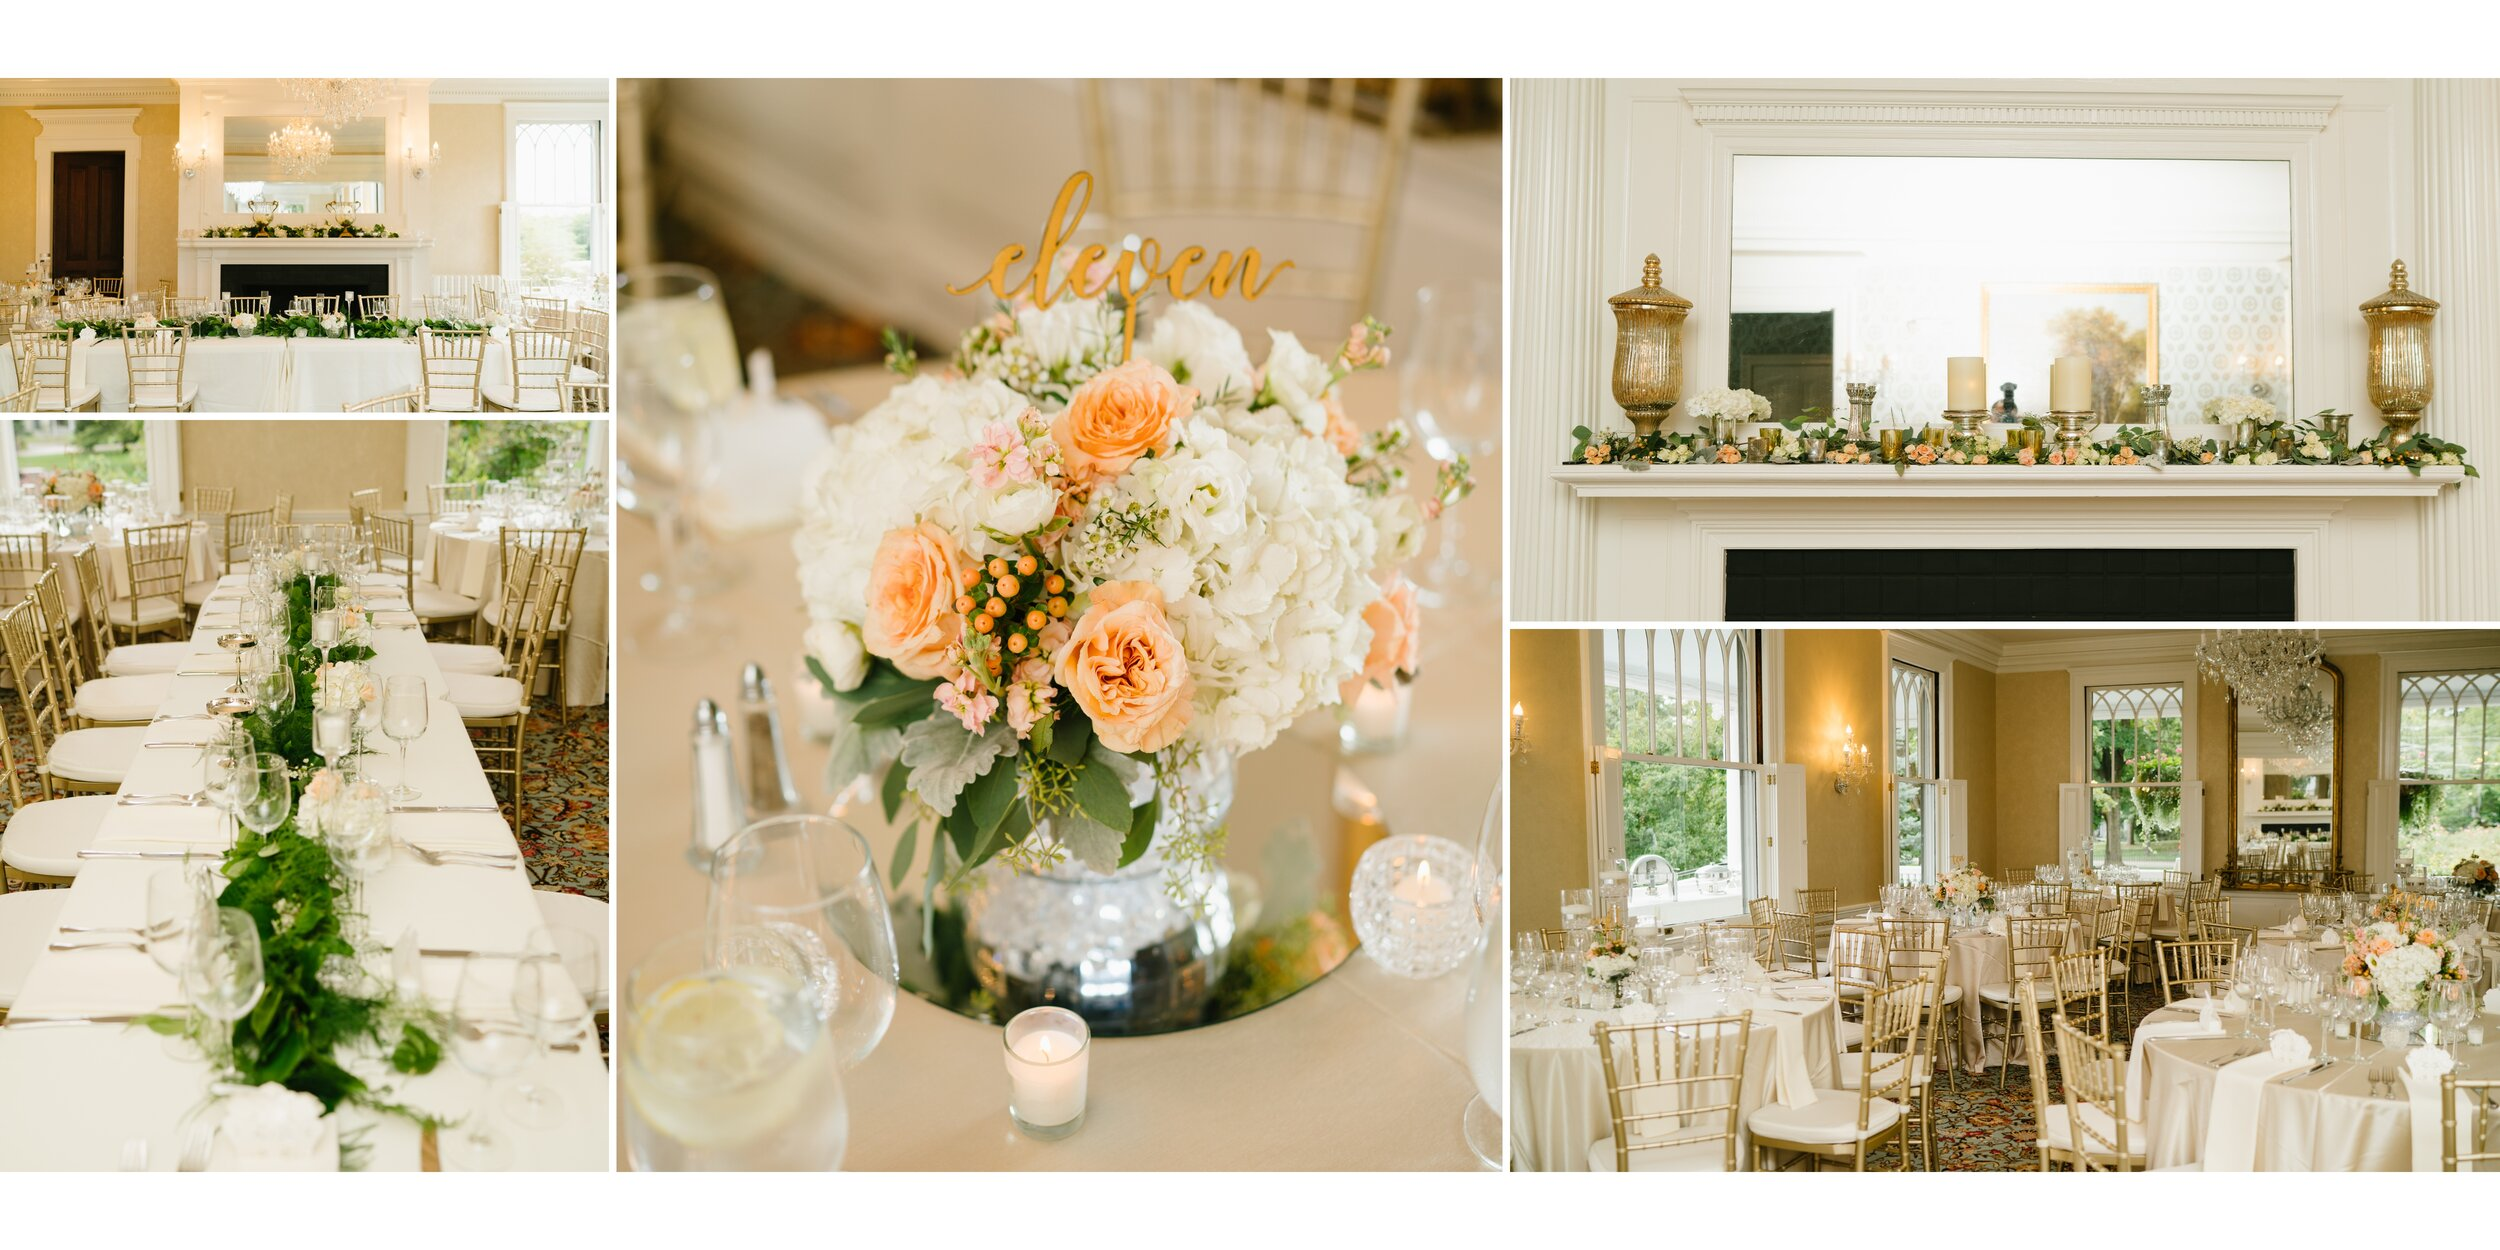 wedding details at lounsbury house